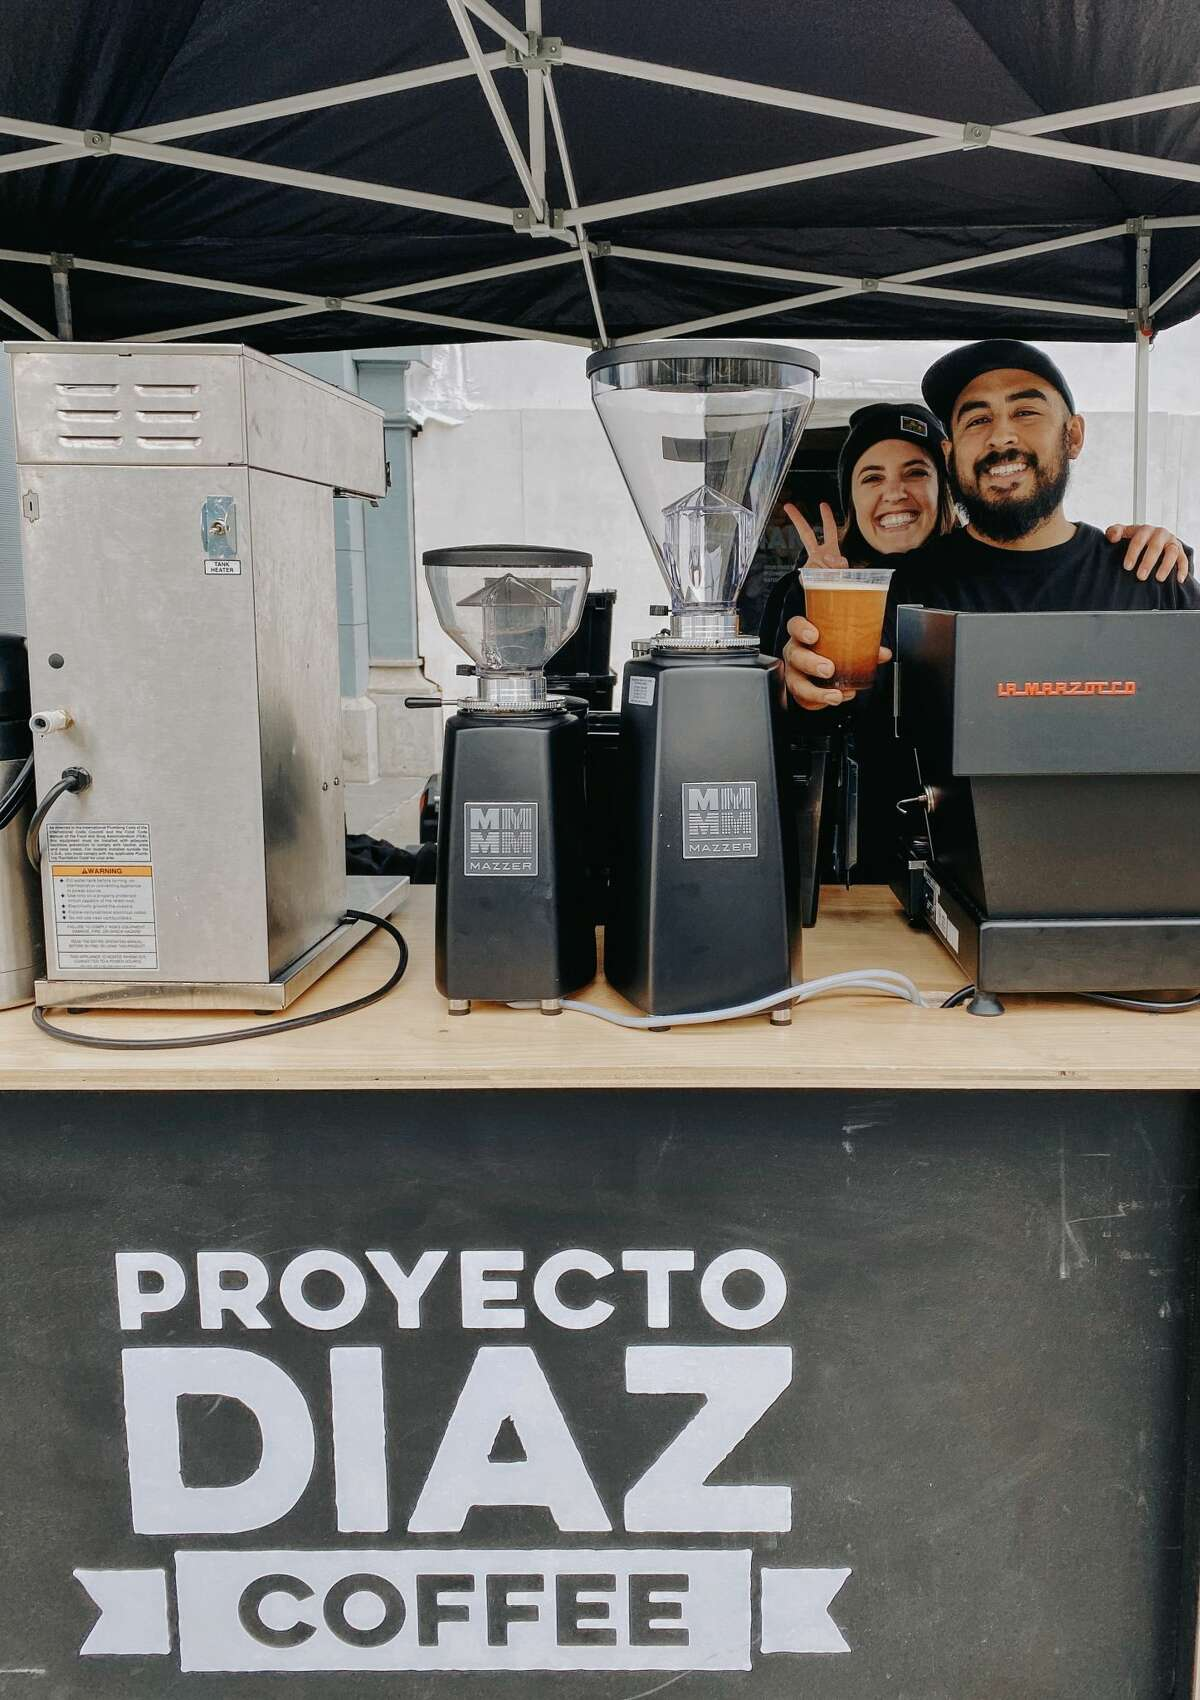 Hannah-Love Diaz and Fernando Diaz of Proyecto Diaz Coffee at the San Francisco Ferry Building Farmer's Market